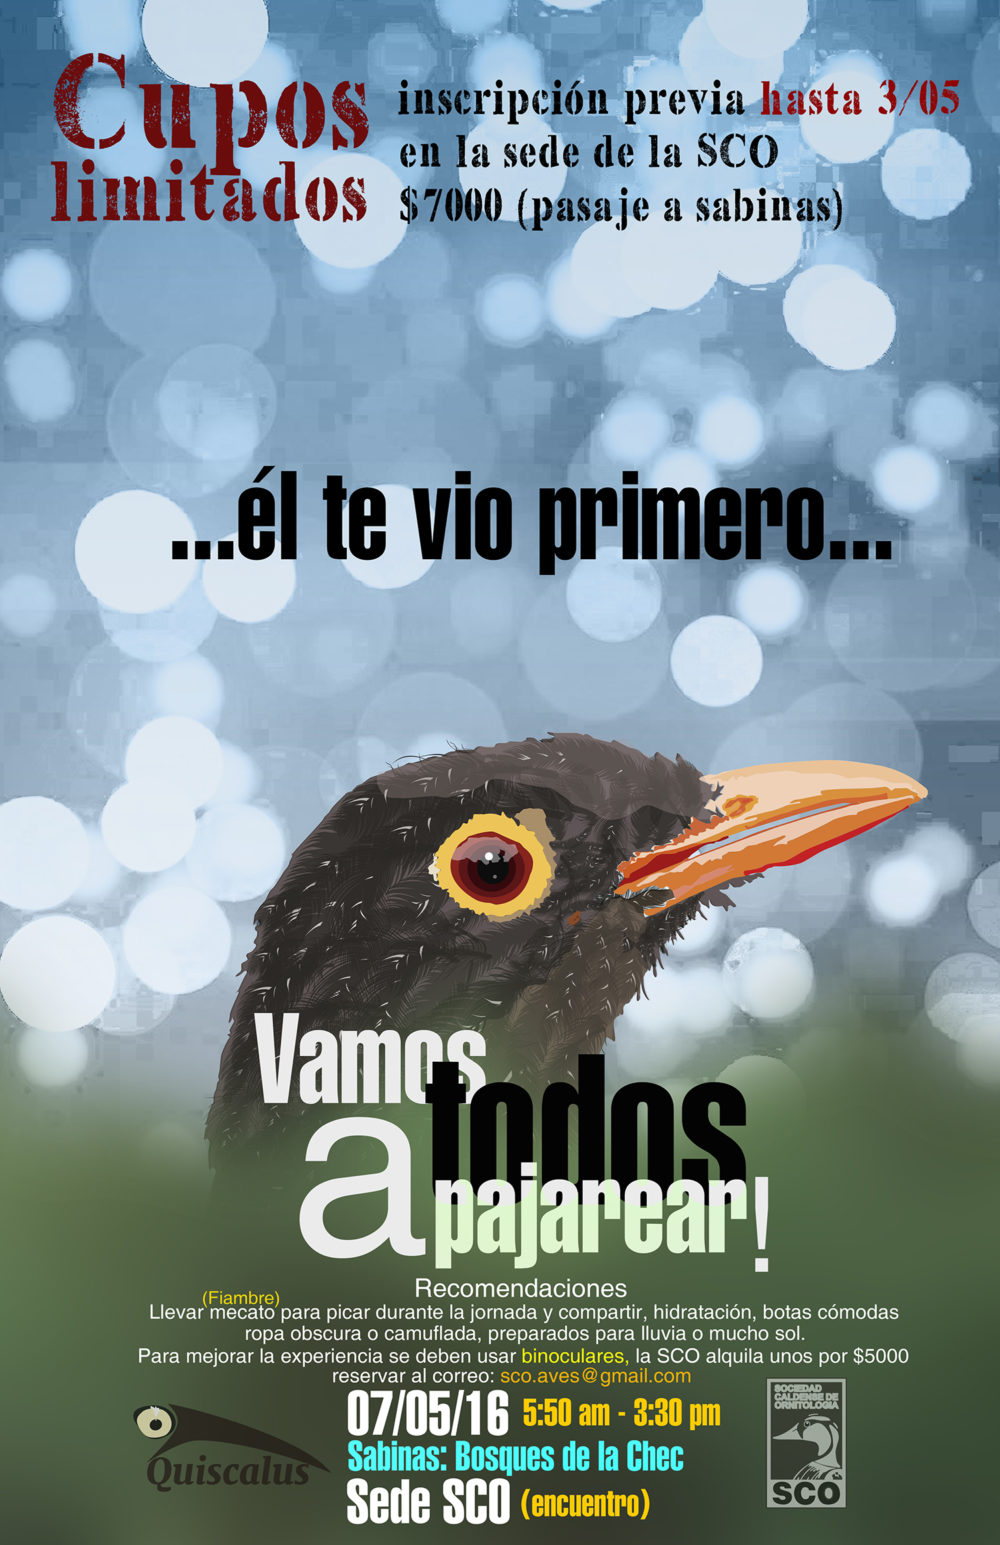 VamosTodosaPajarear-Sabinas-LaChec